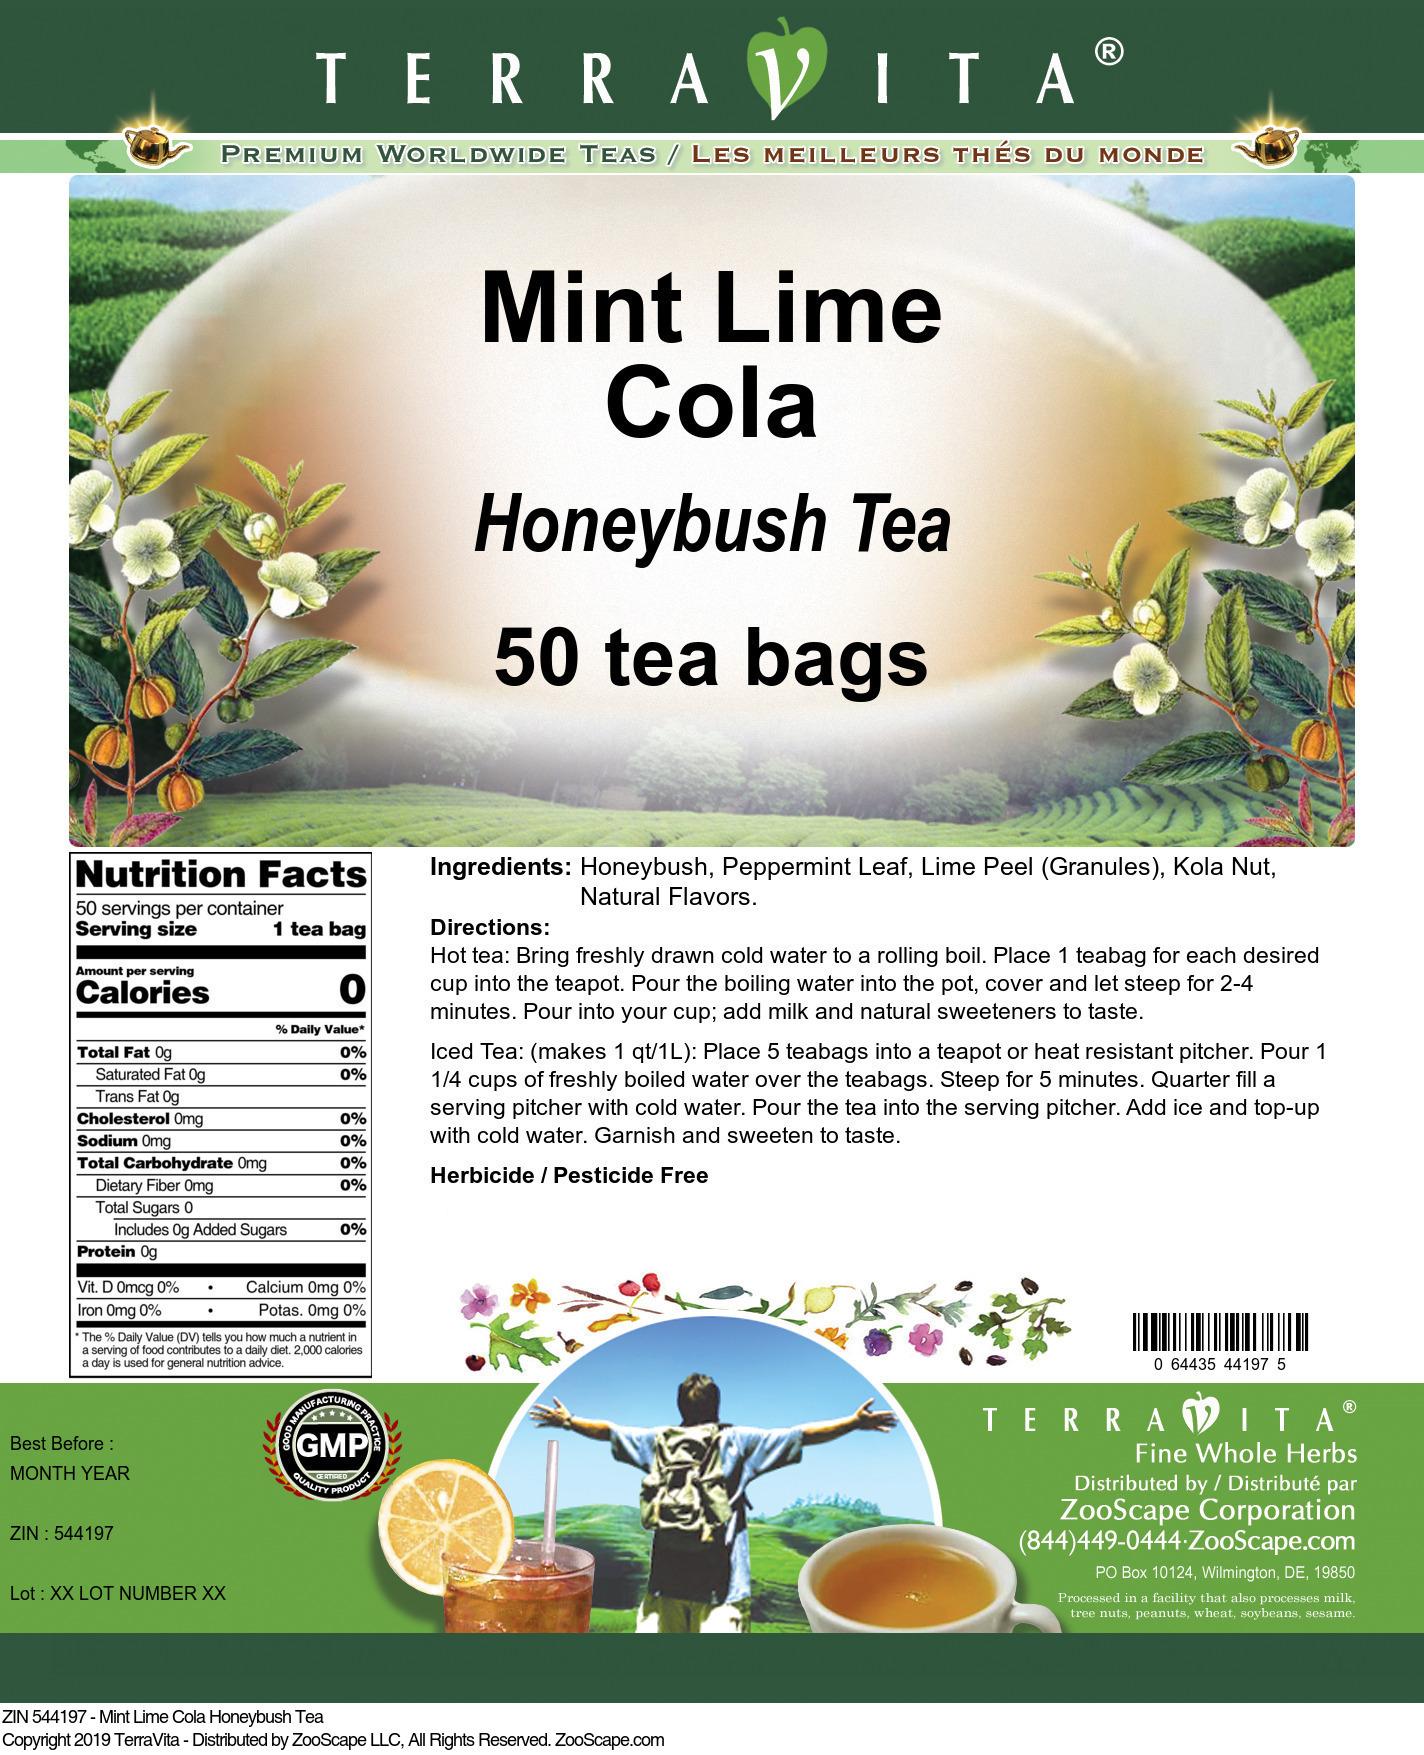 Mint Lime Cola Honeybush Tea